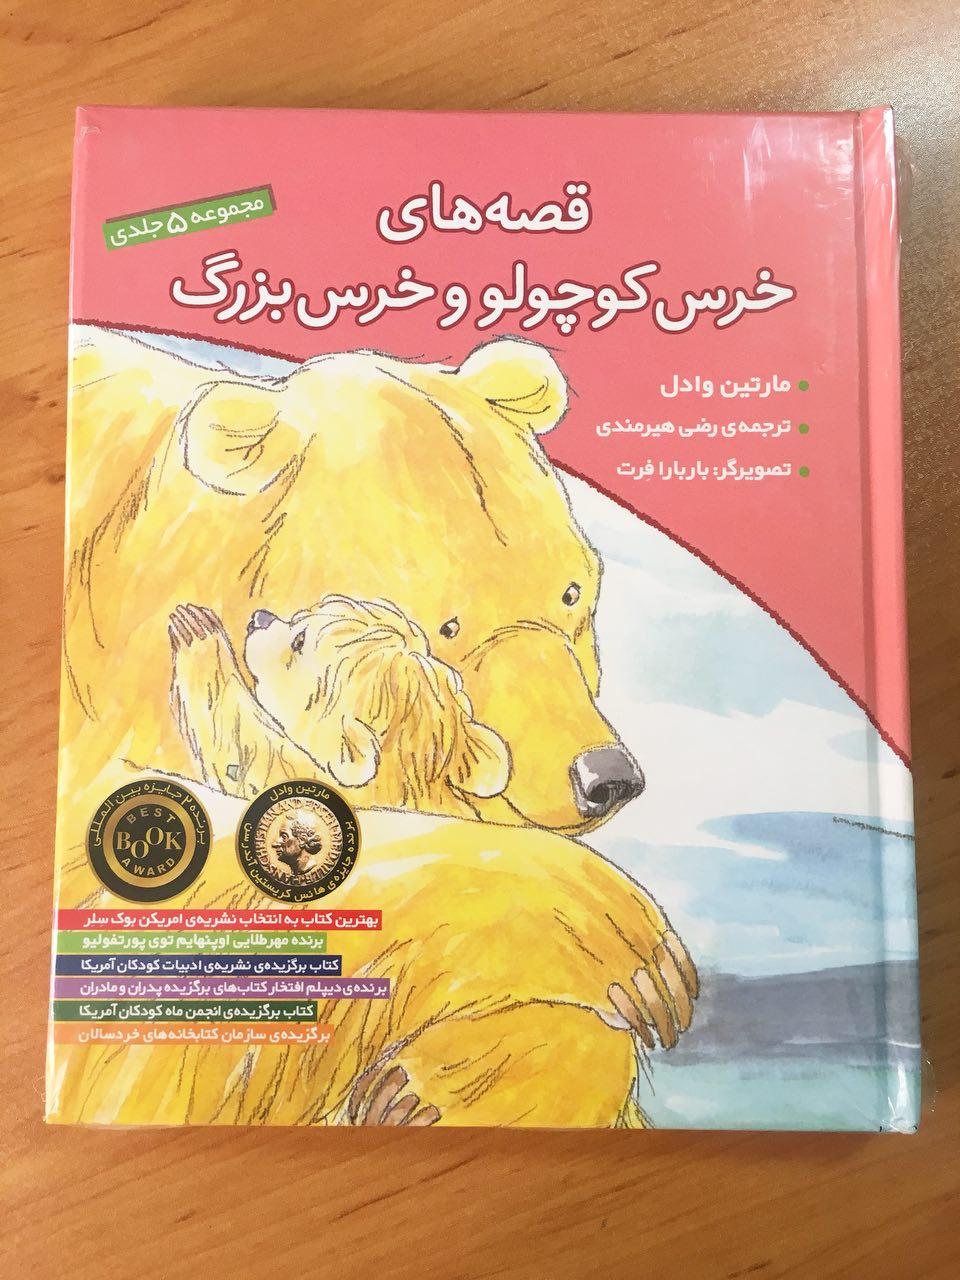 معرفى كتاب قصه هاى خرس كوچولو و خرس بزرگ